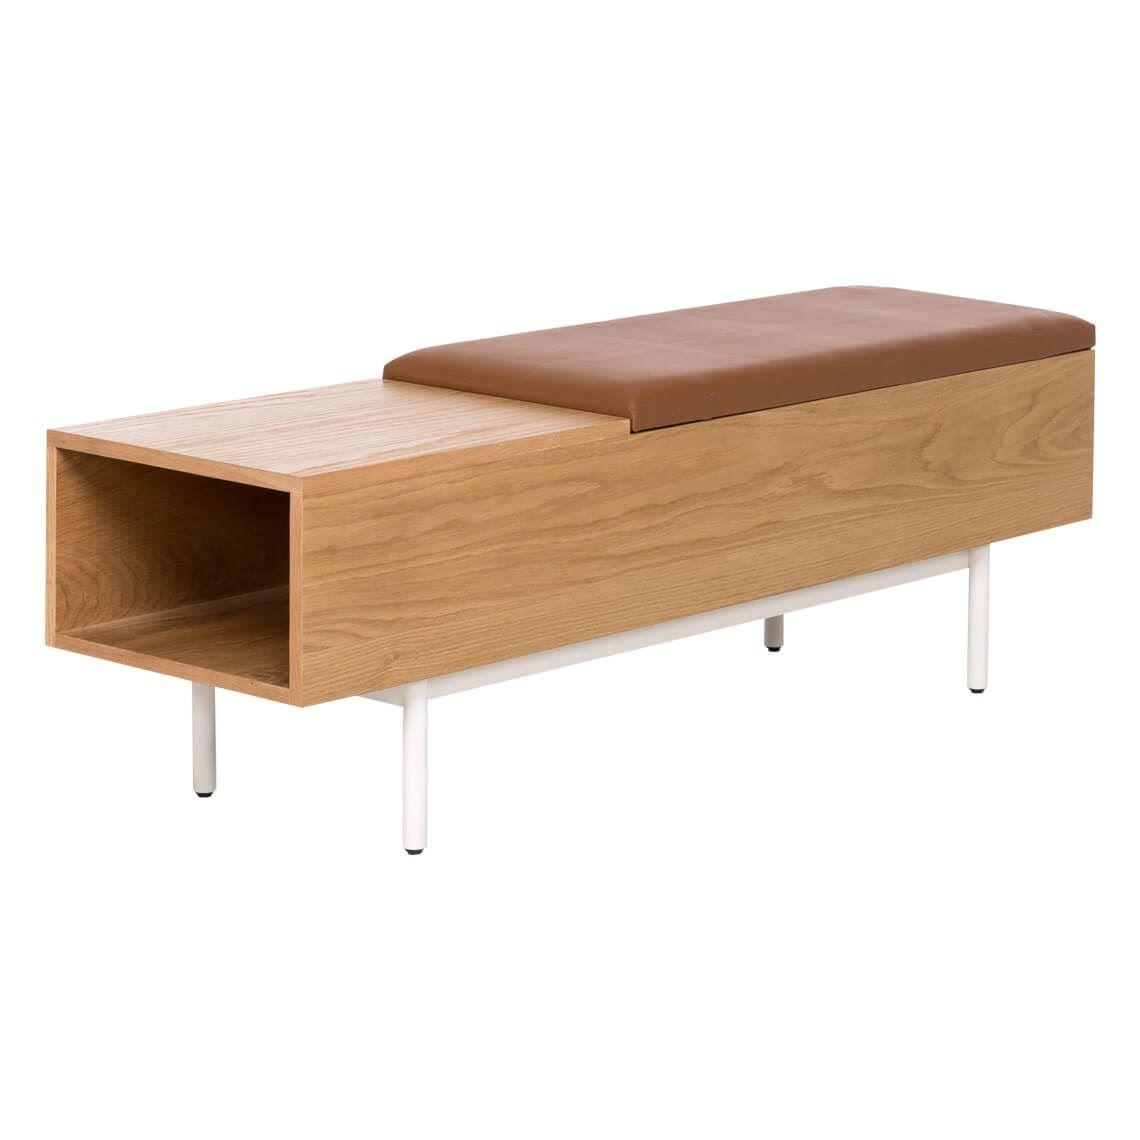 Enjoyable Wren Storage Bench Natural White In 2019 Products Inzonedesignstudio Interior Chair Design Inzonedesignstudiocom